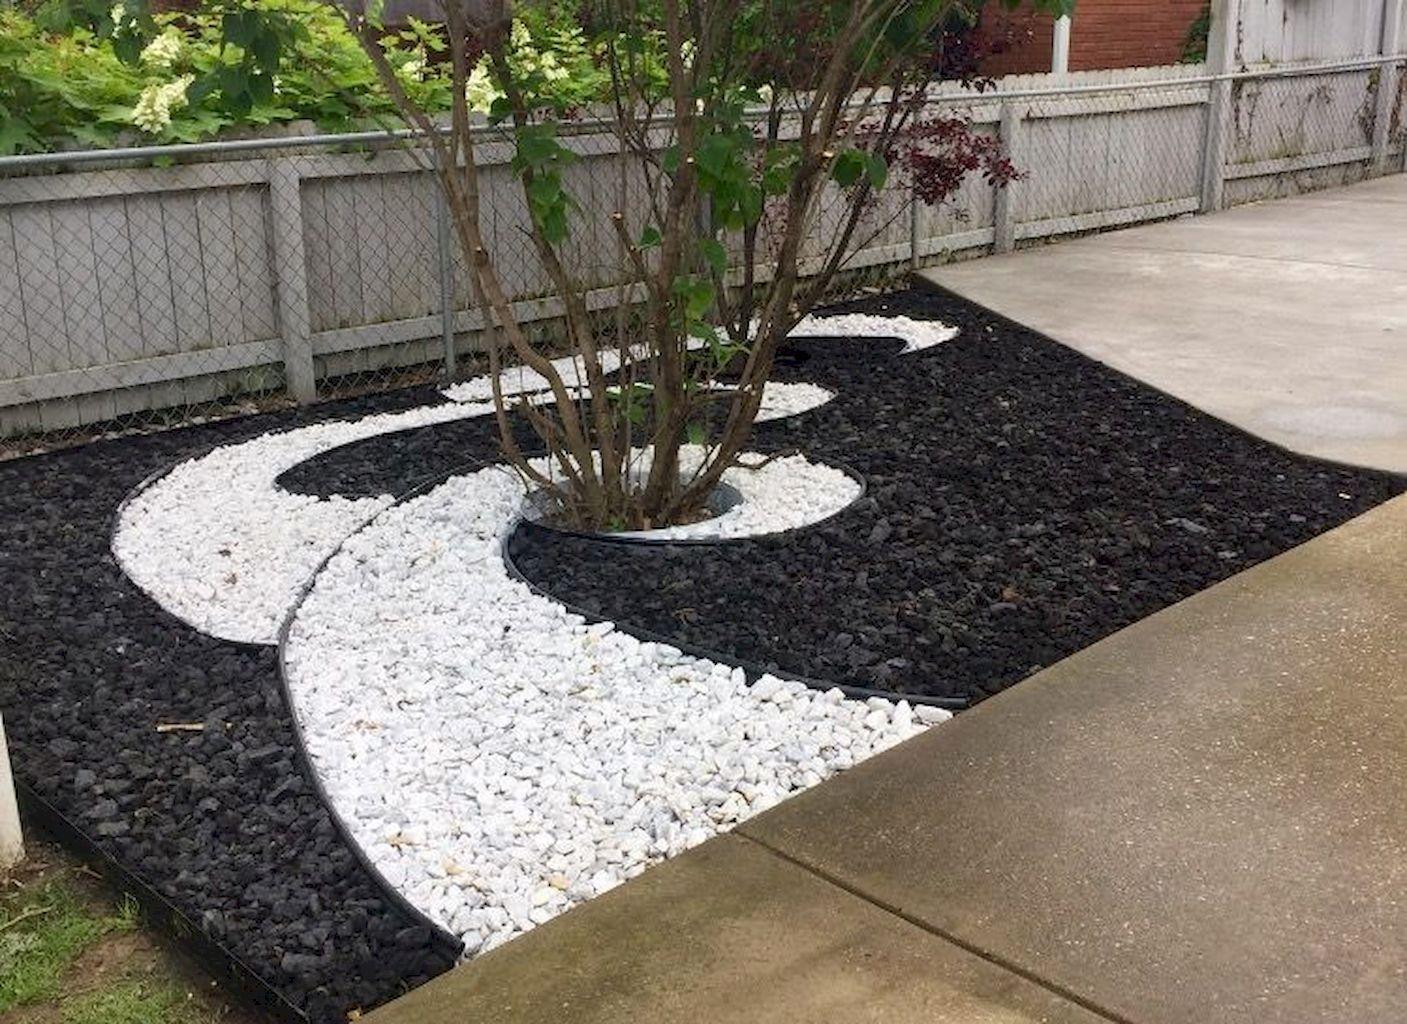 75 Front Yard Rock GardenLandscaping Ideas - Structhome.com #yardlandscaping